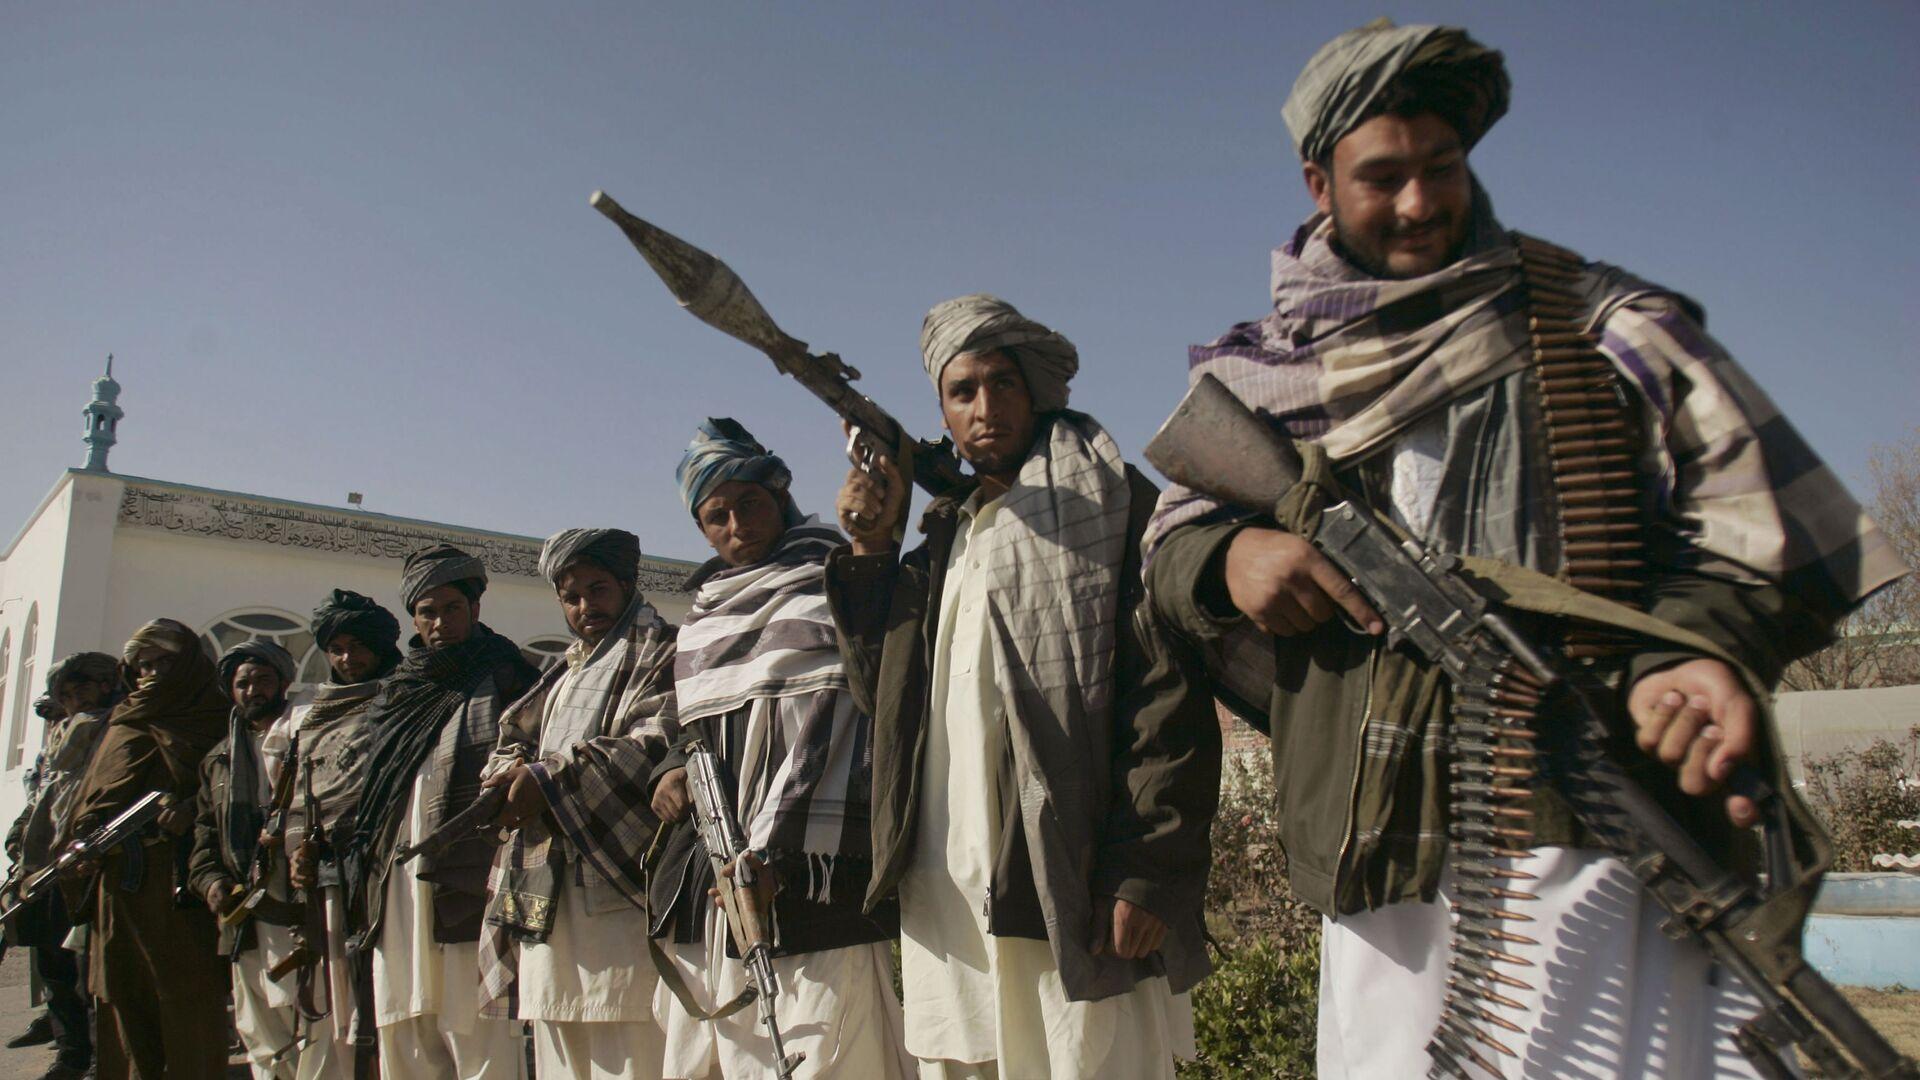 Ex militanti del movimento radicale Talebani a Herat - Sputnik Italia, 1920, 06.08.2021